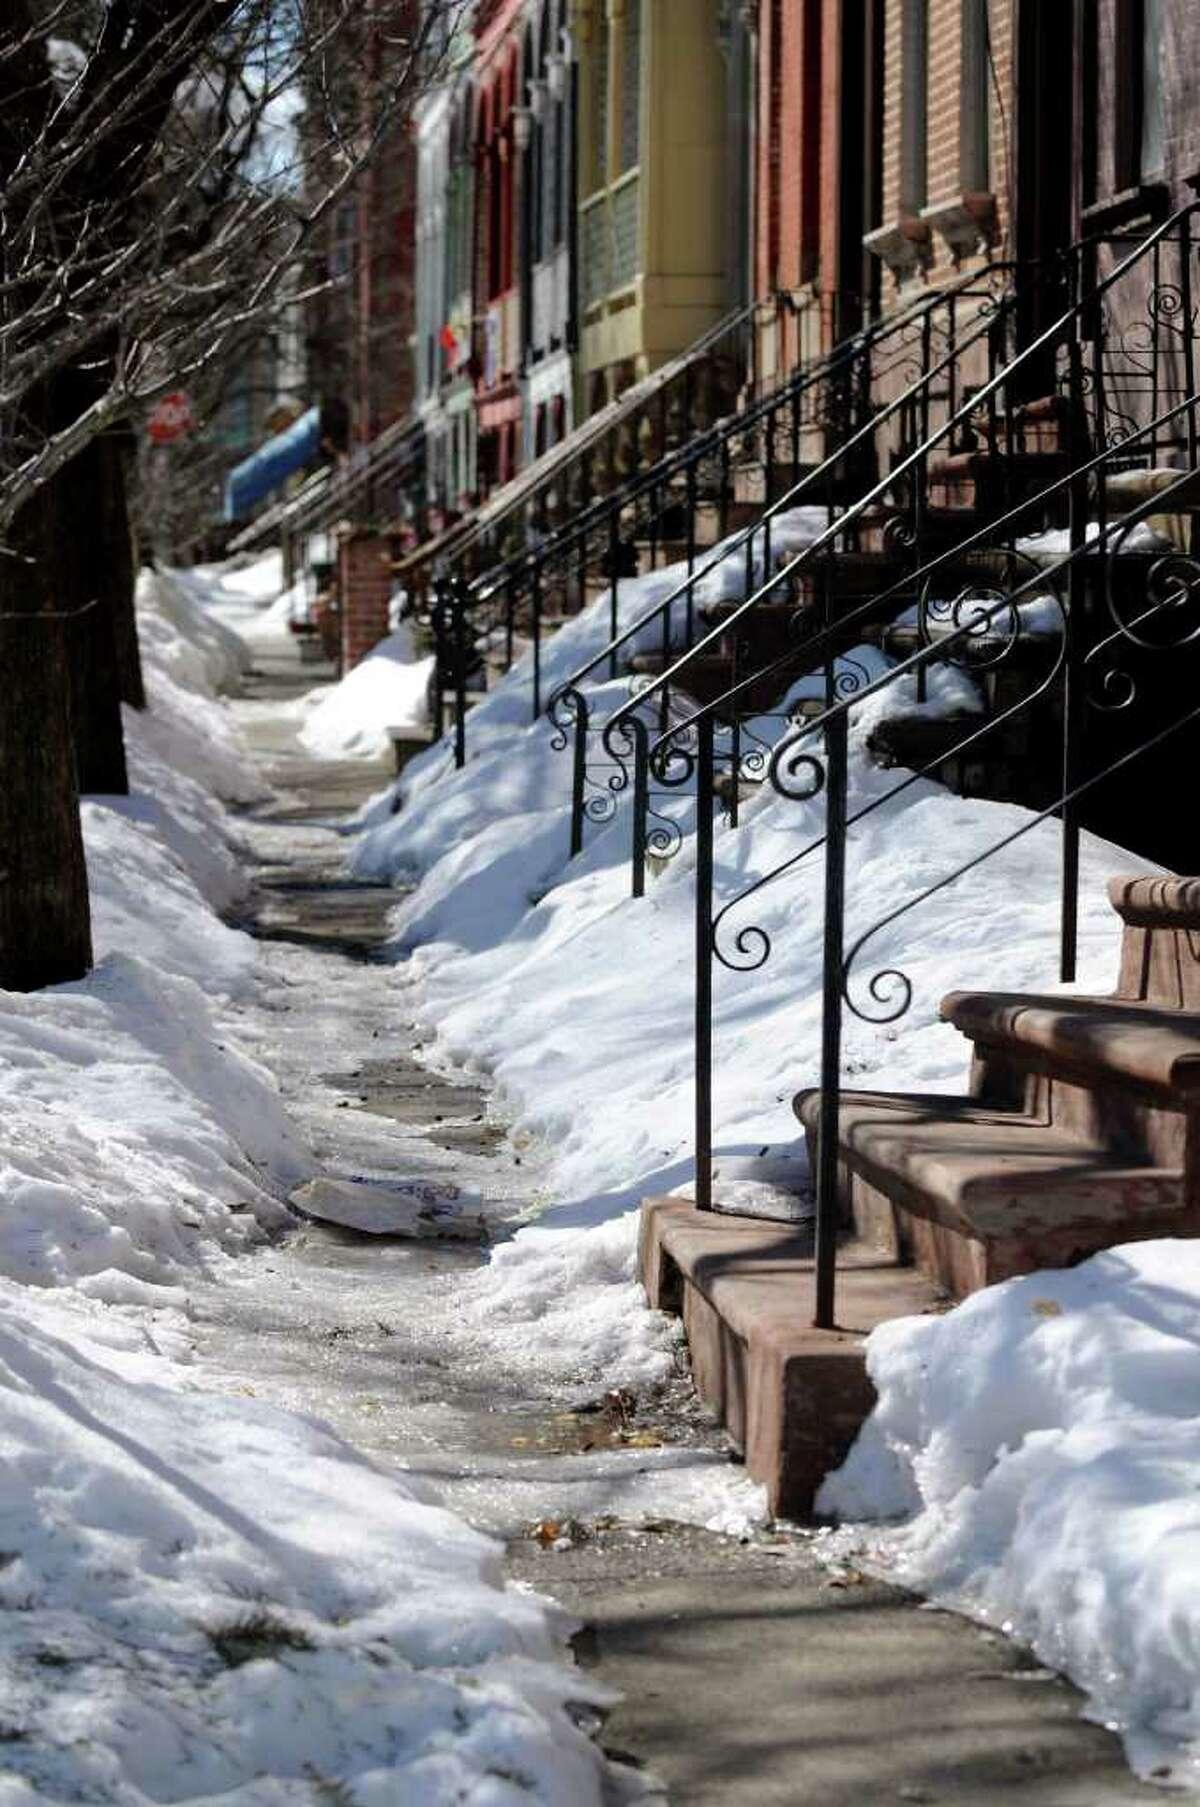 An icy, residential sidewalk in Arbor Hill on Tuesday, Feb. 15, 2011, in Albany, N.Y. (Cindy Schultz / Times Union)